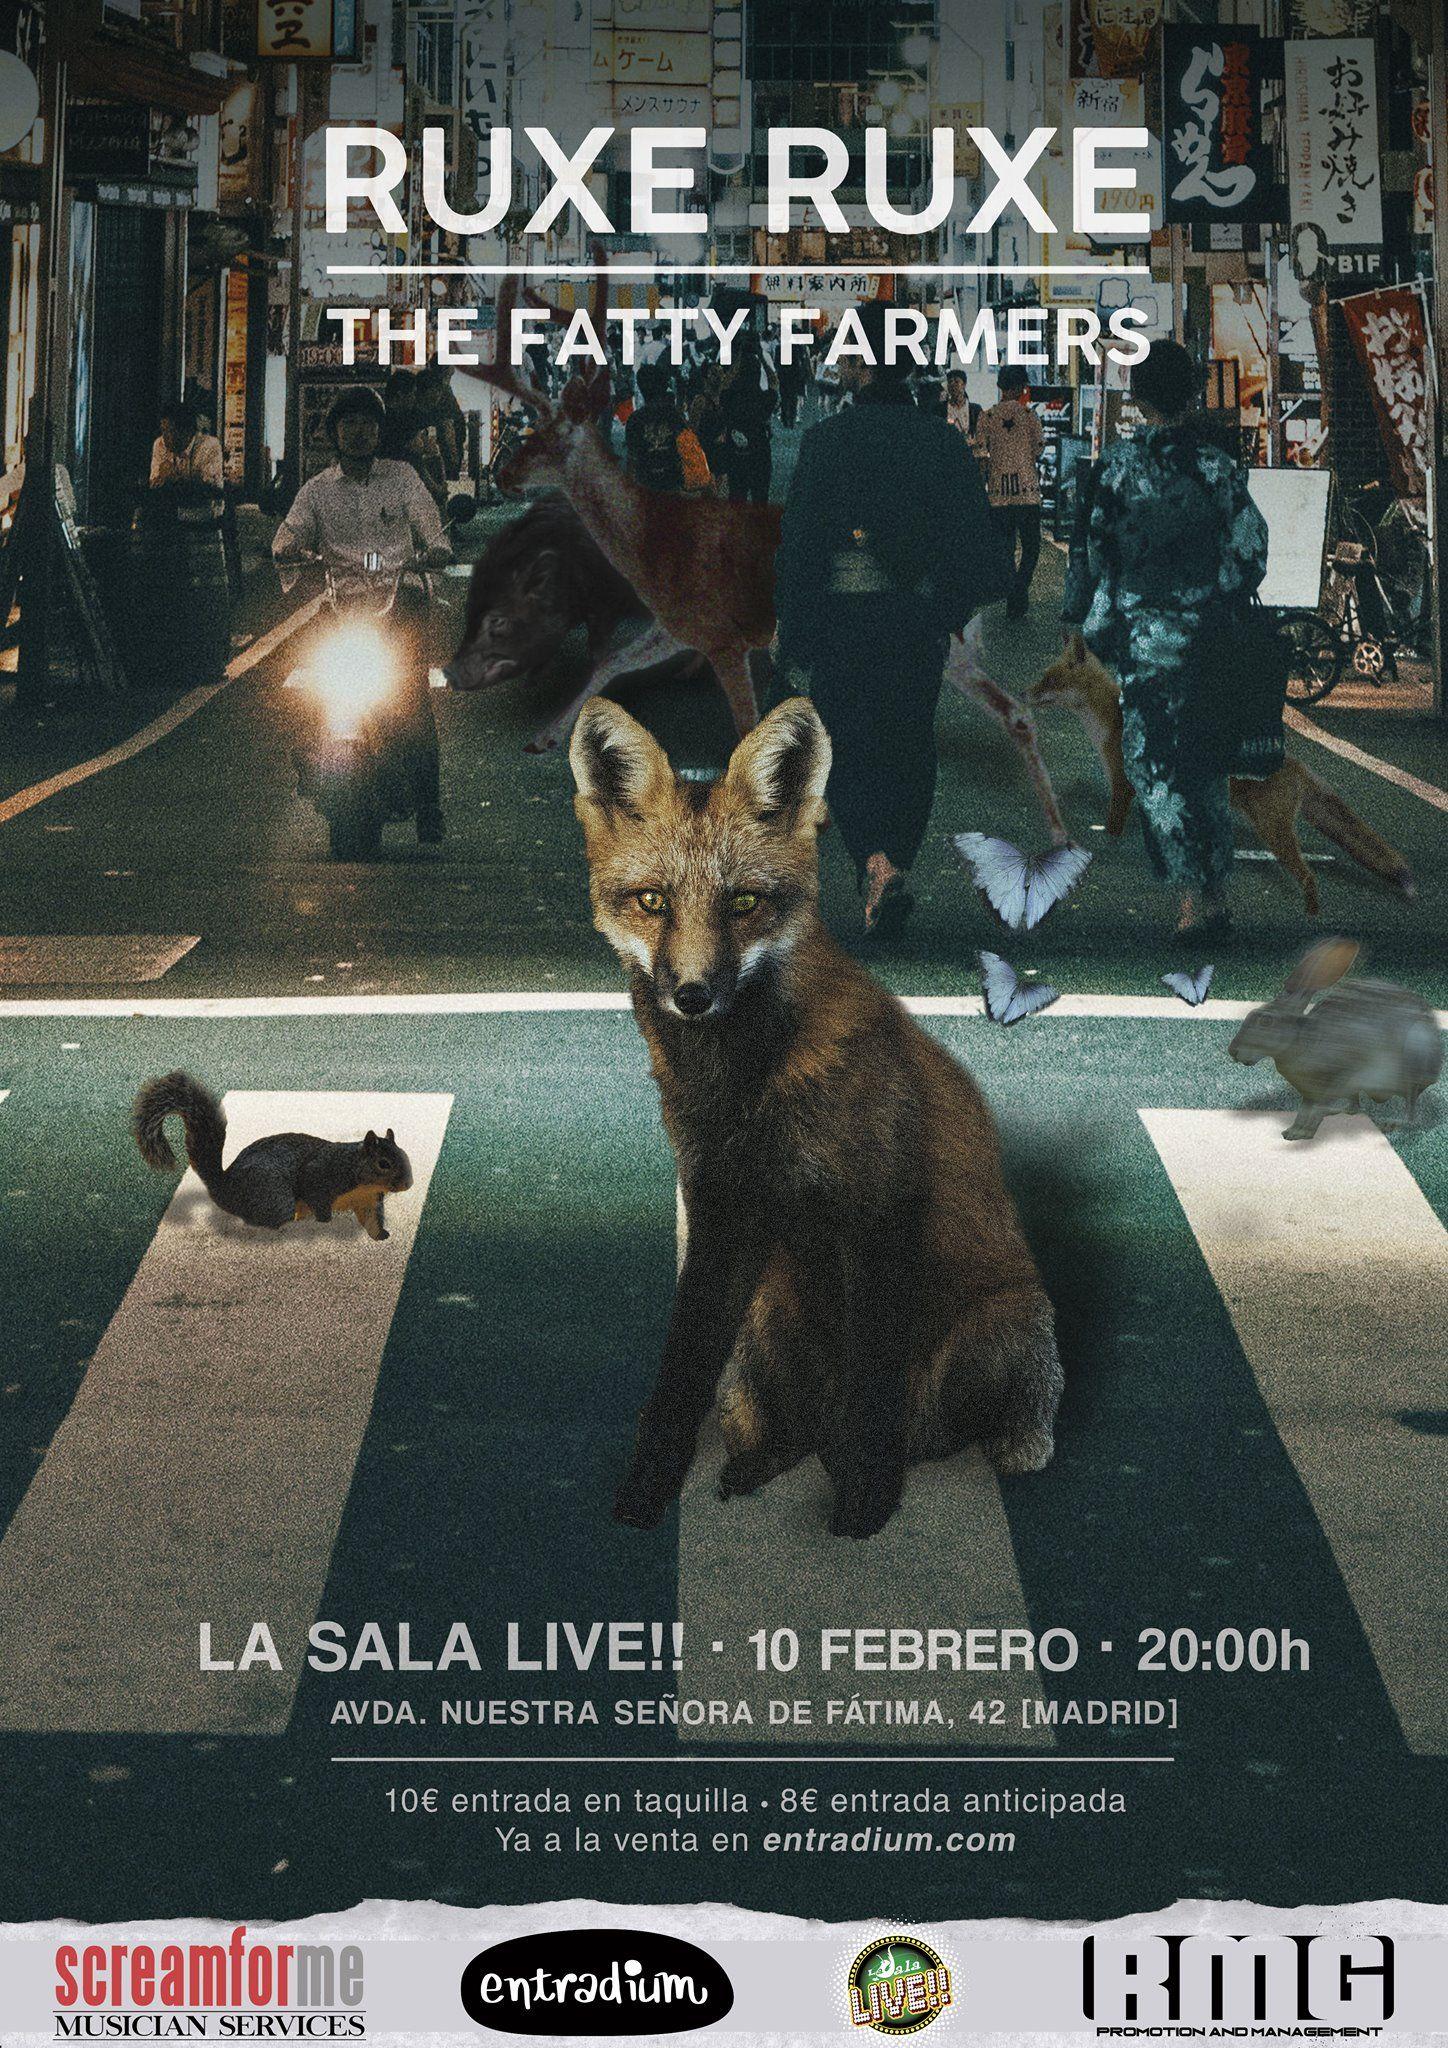 Ruxe Ruxe + The Fatty Farmers